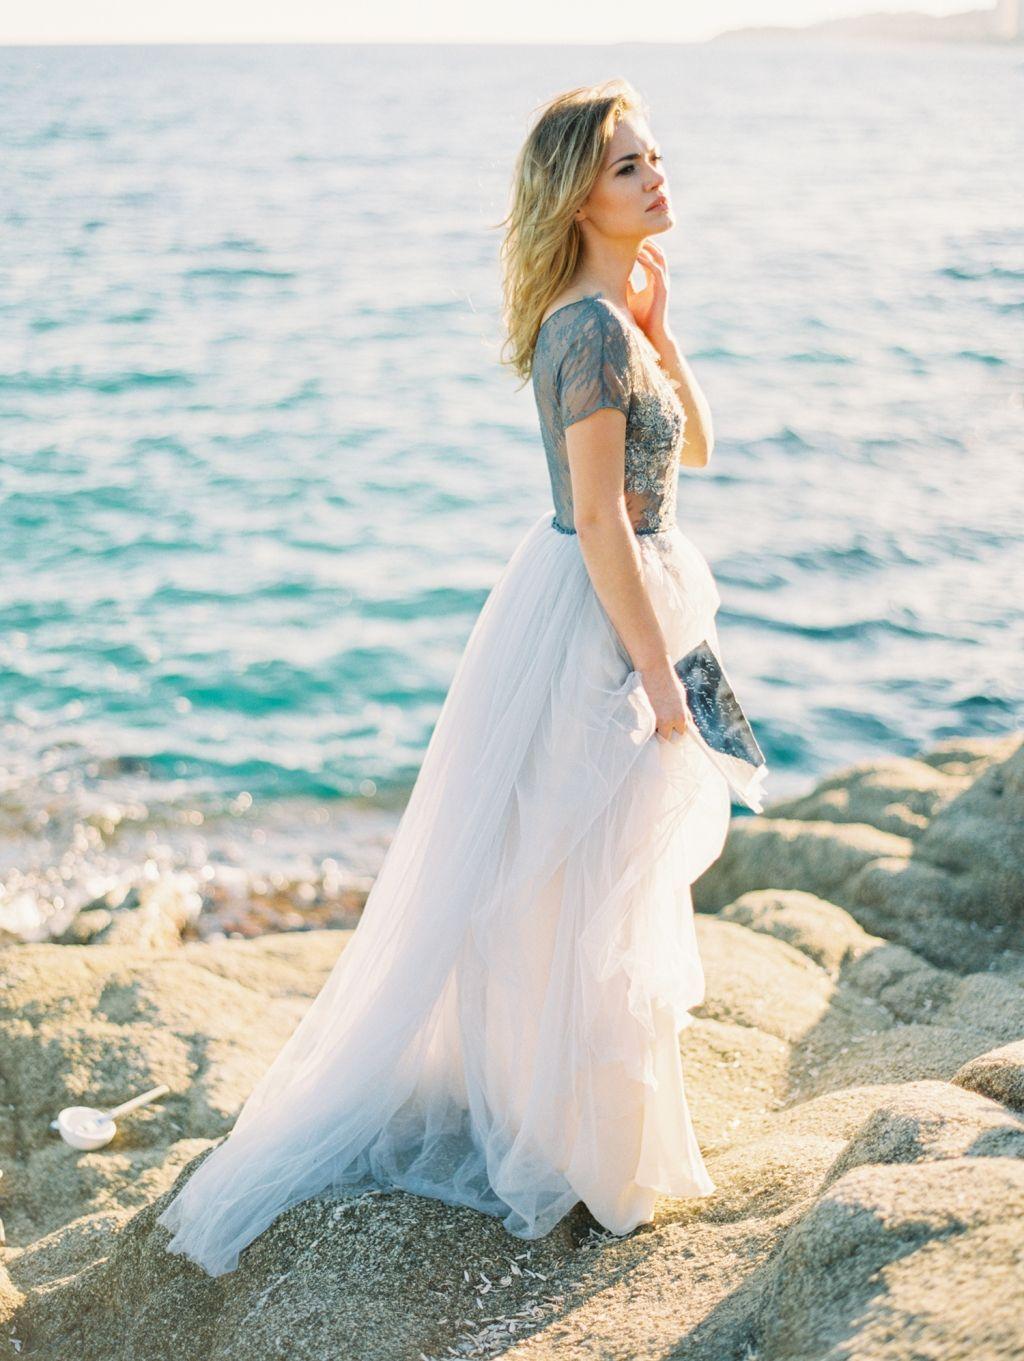 Beautifully elegant coastal wedding inspiration from Spain ...